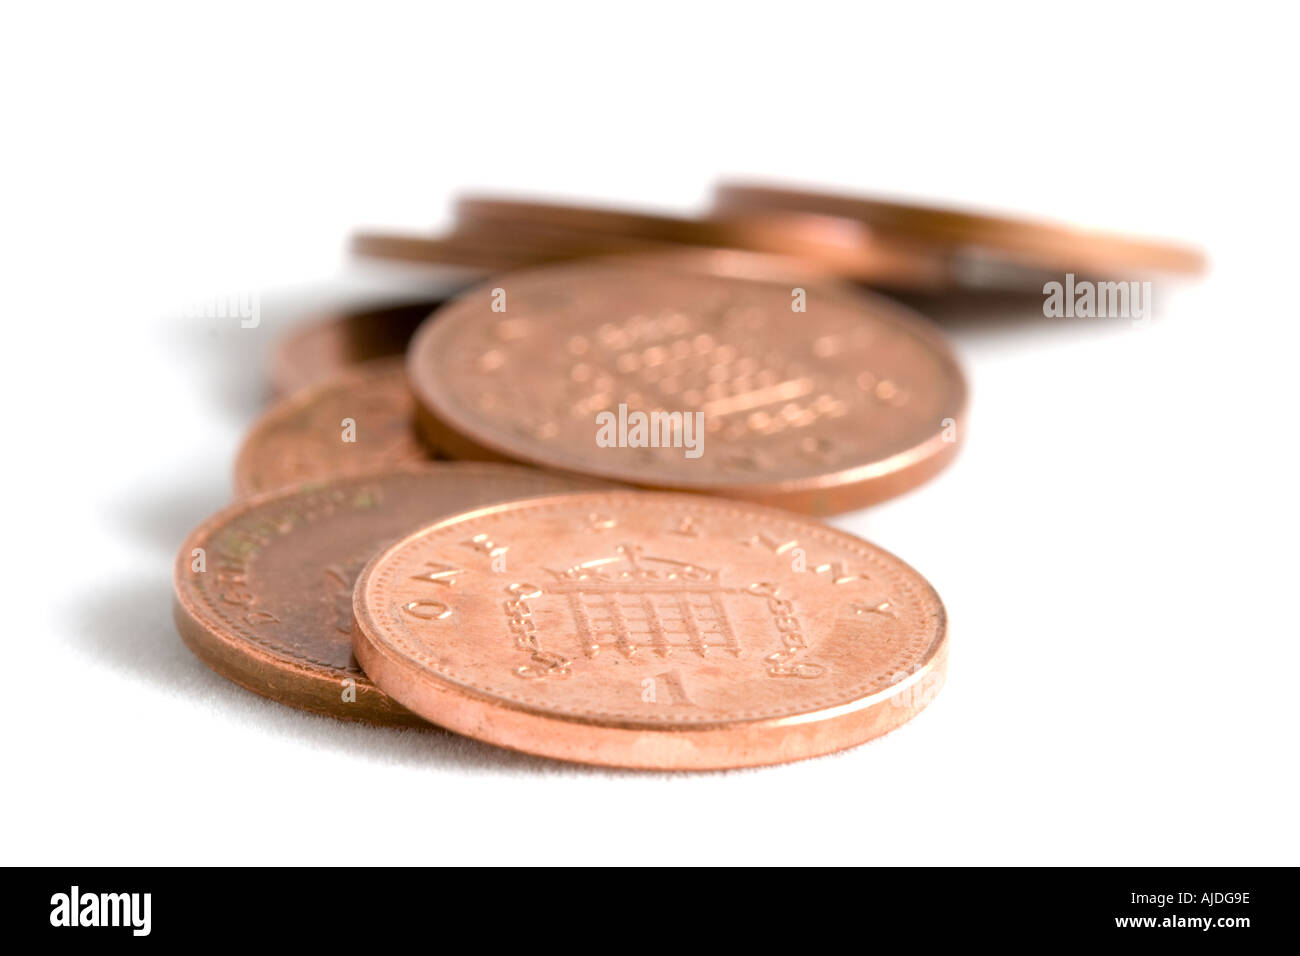 British pennies - Stock Image